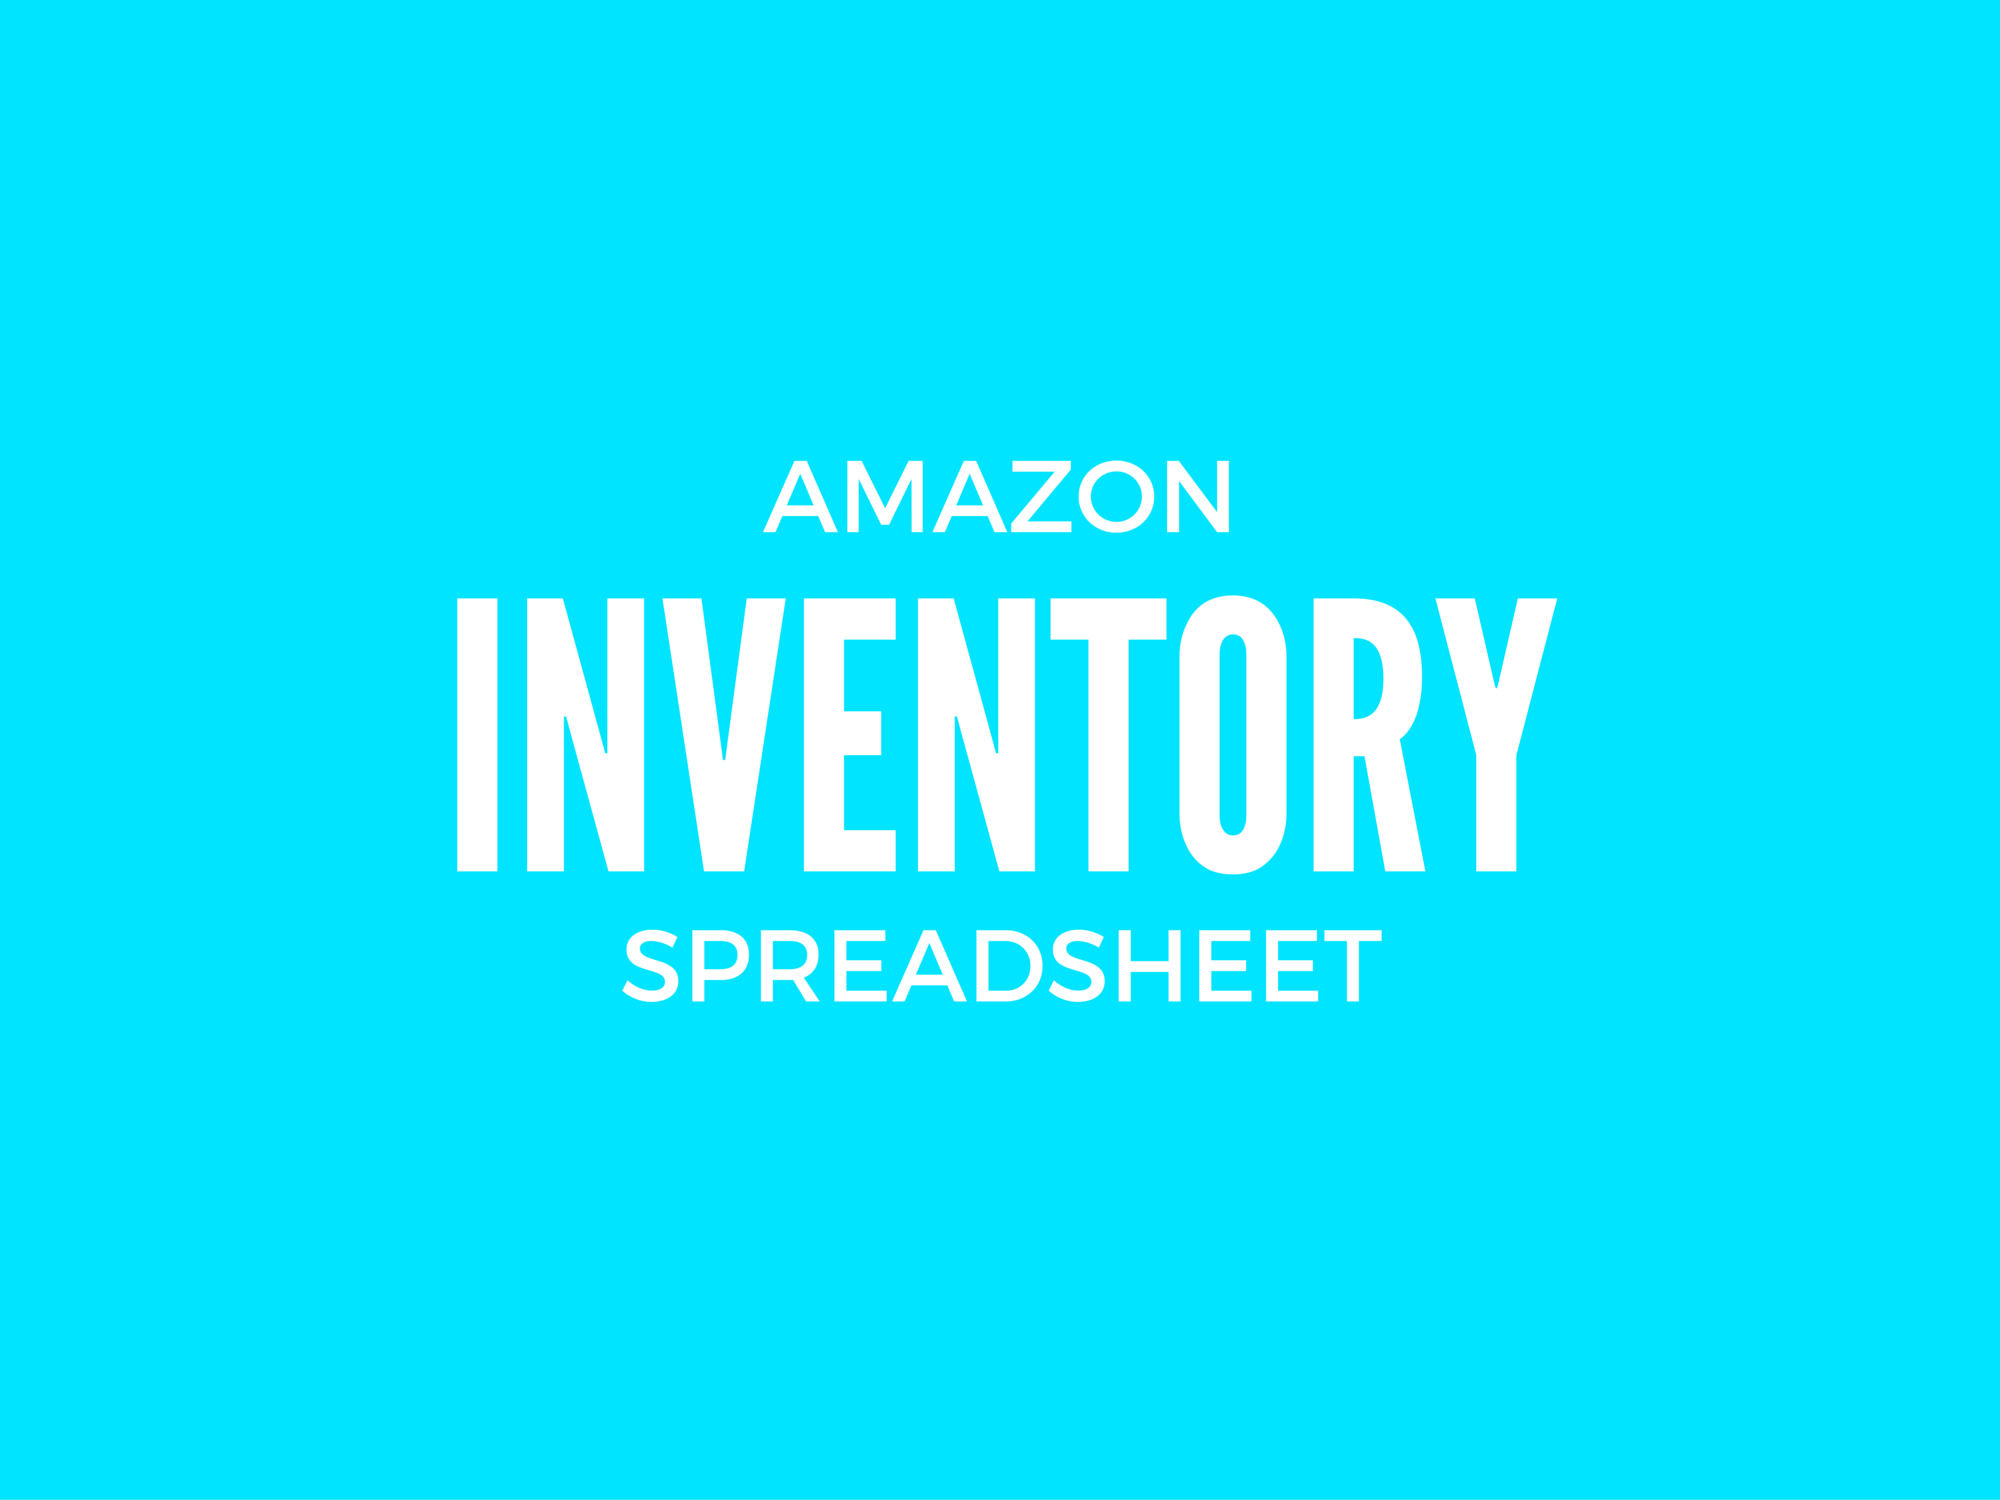 Amazon Inventory Spreadsheet (add on)